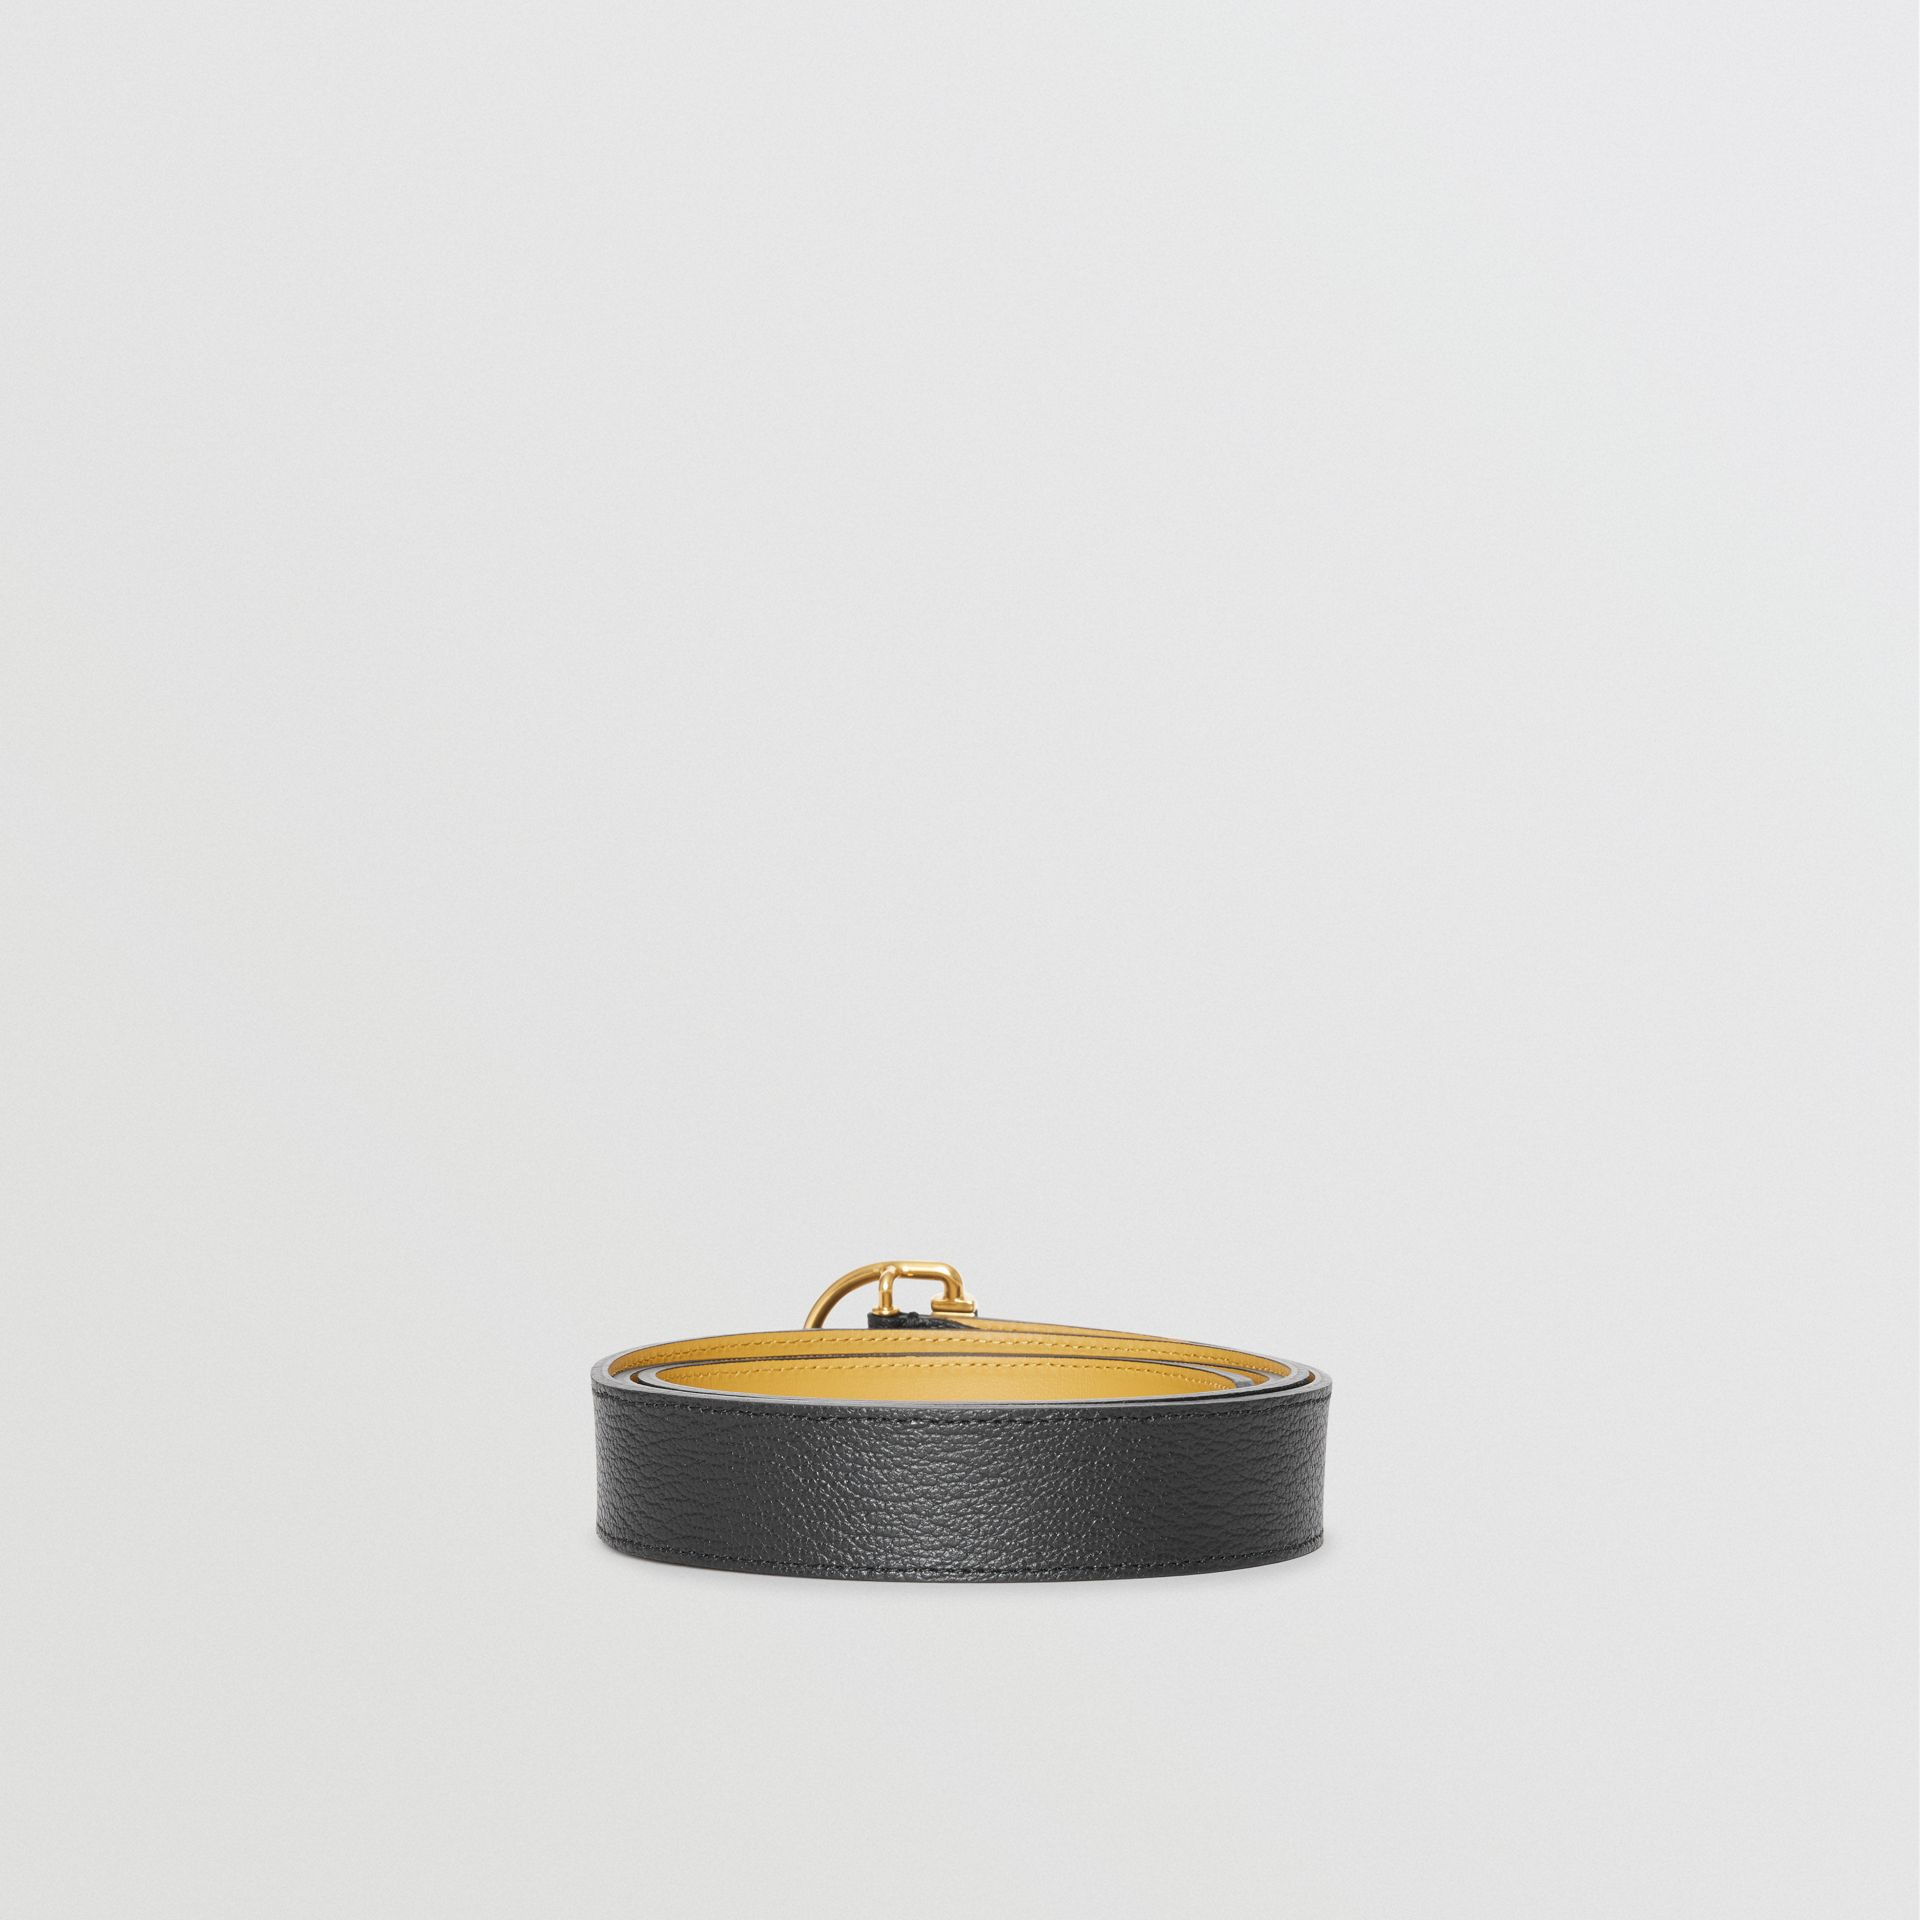 Grainy Leather D-ring Belt in Black/cornflower - Women | Burberry Australia - gallery image 4